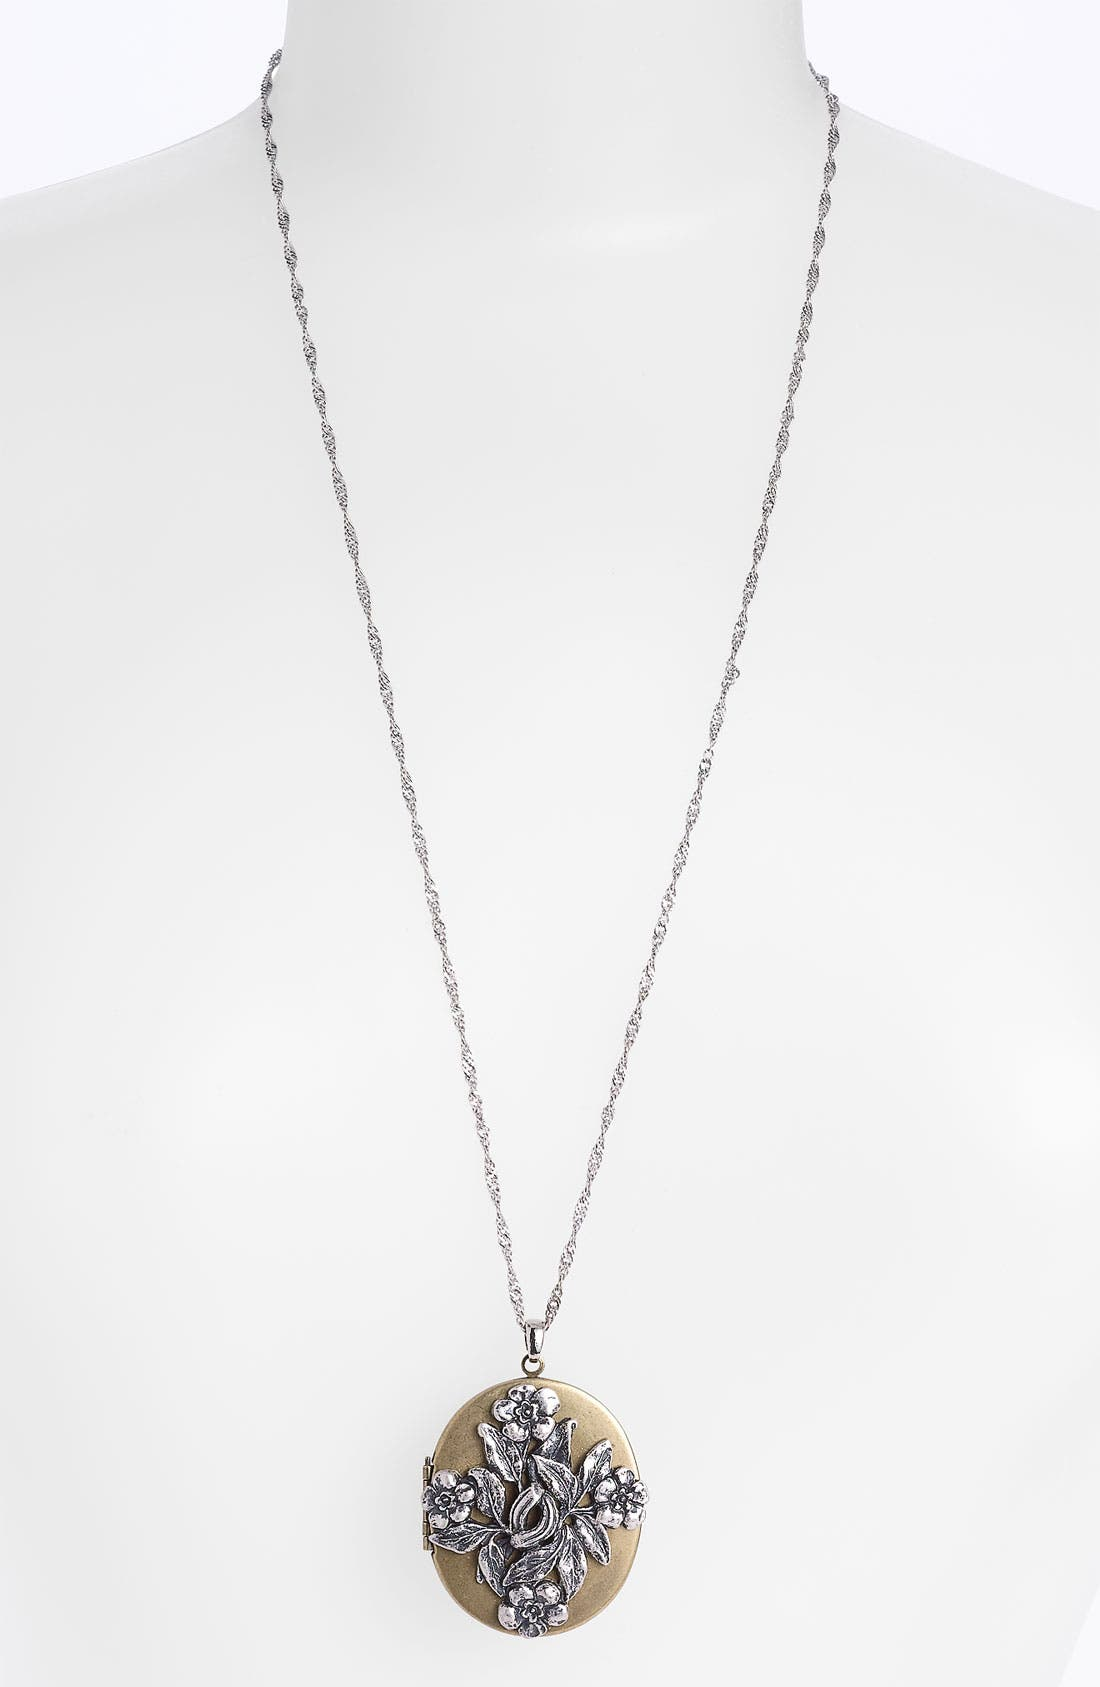 Alternate Image 1 Selected - Nordstrom 'Romantics' Locket Necklace